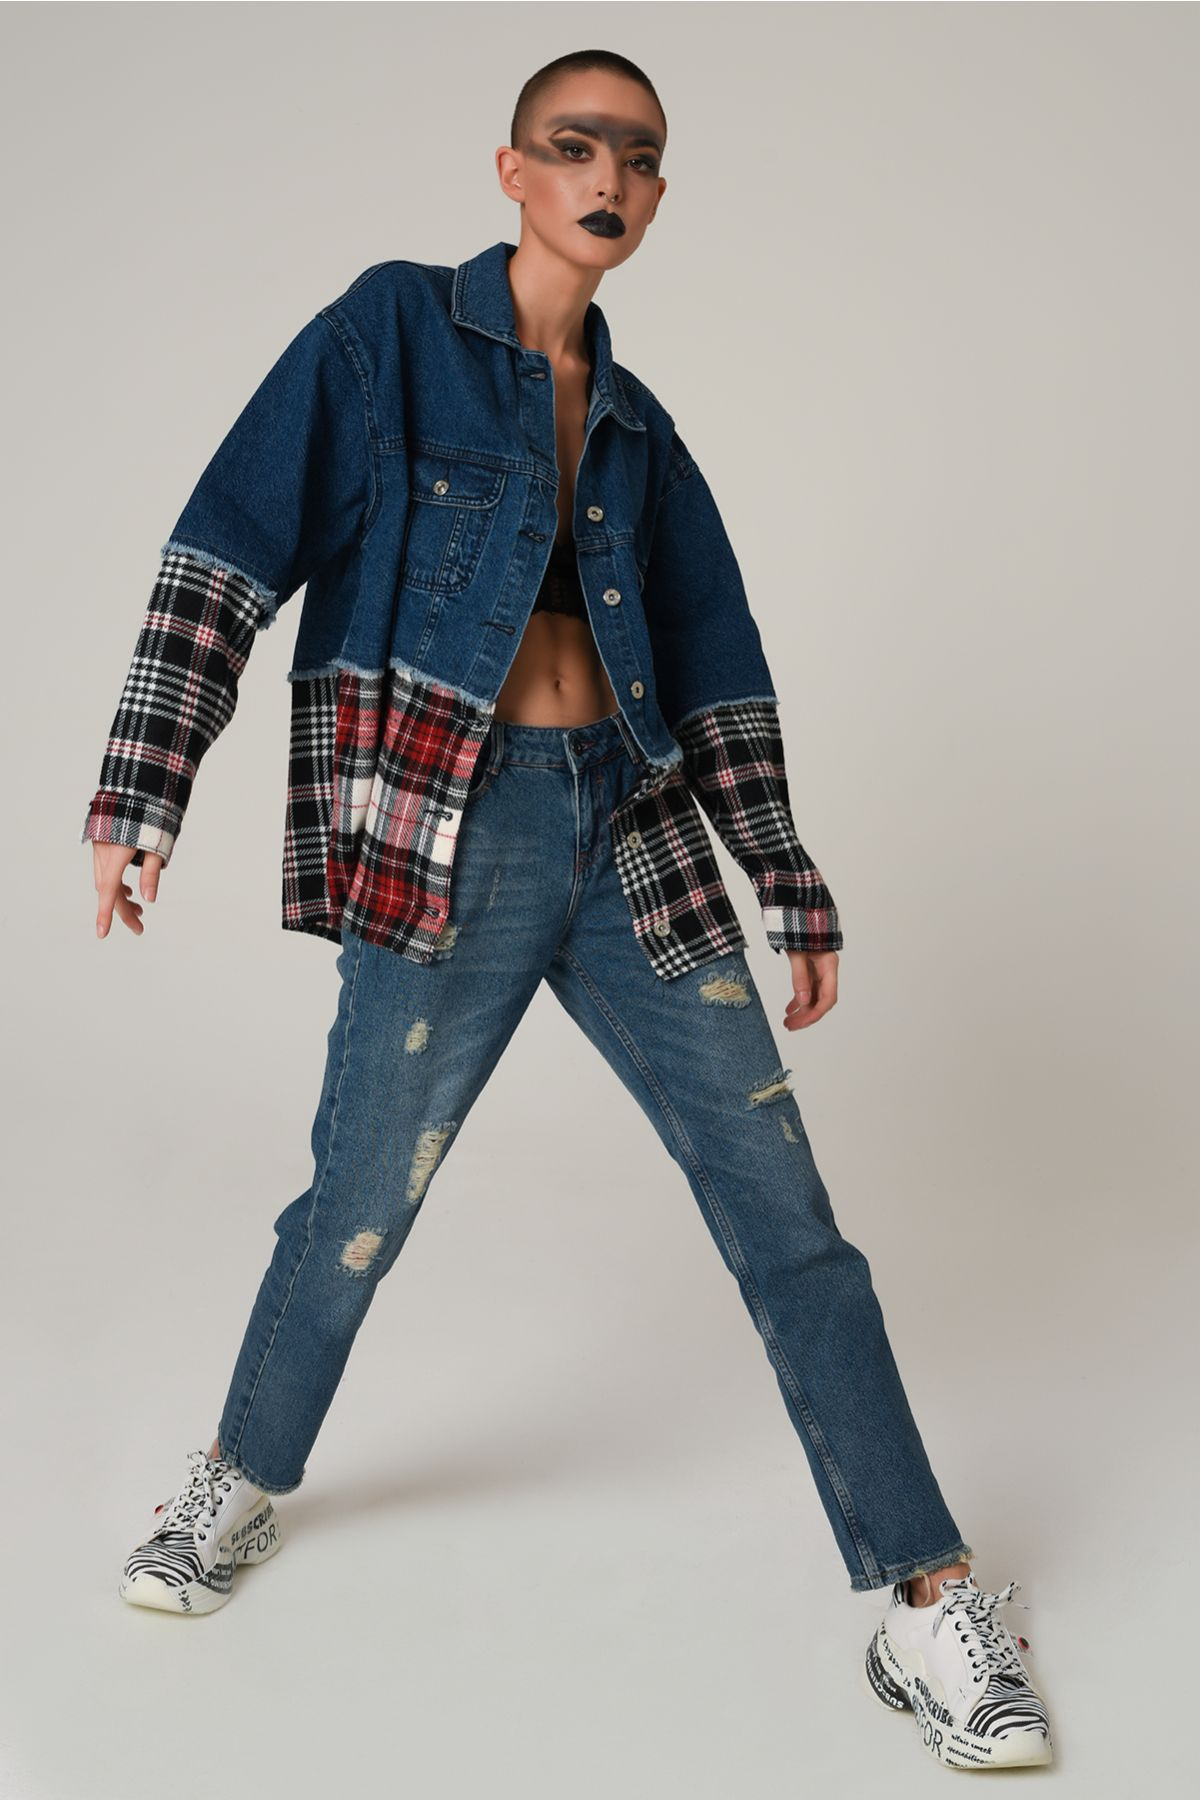 Ketzz 3020 ТЕМНО-СИНИЙ Женская Куртка